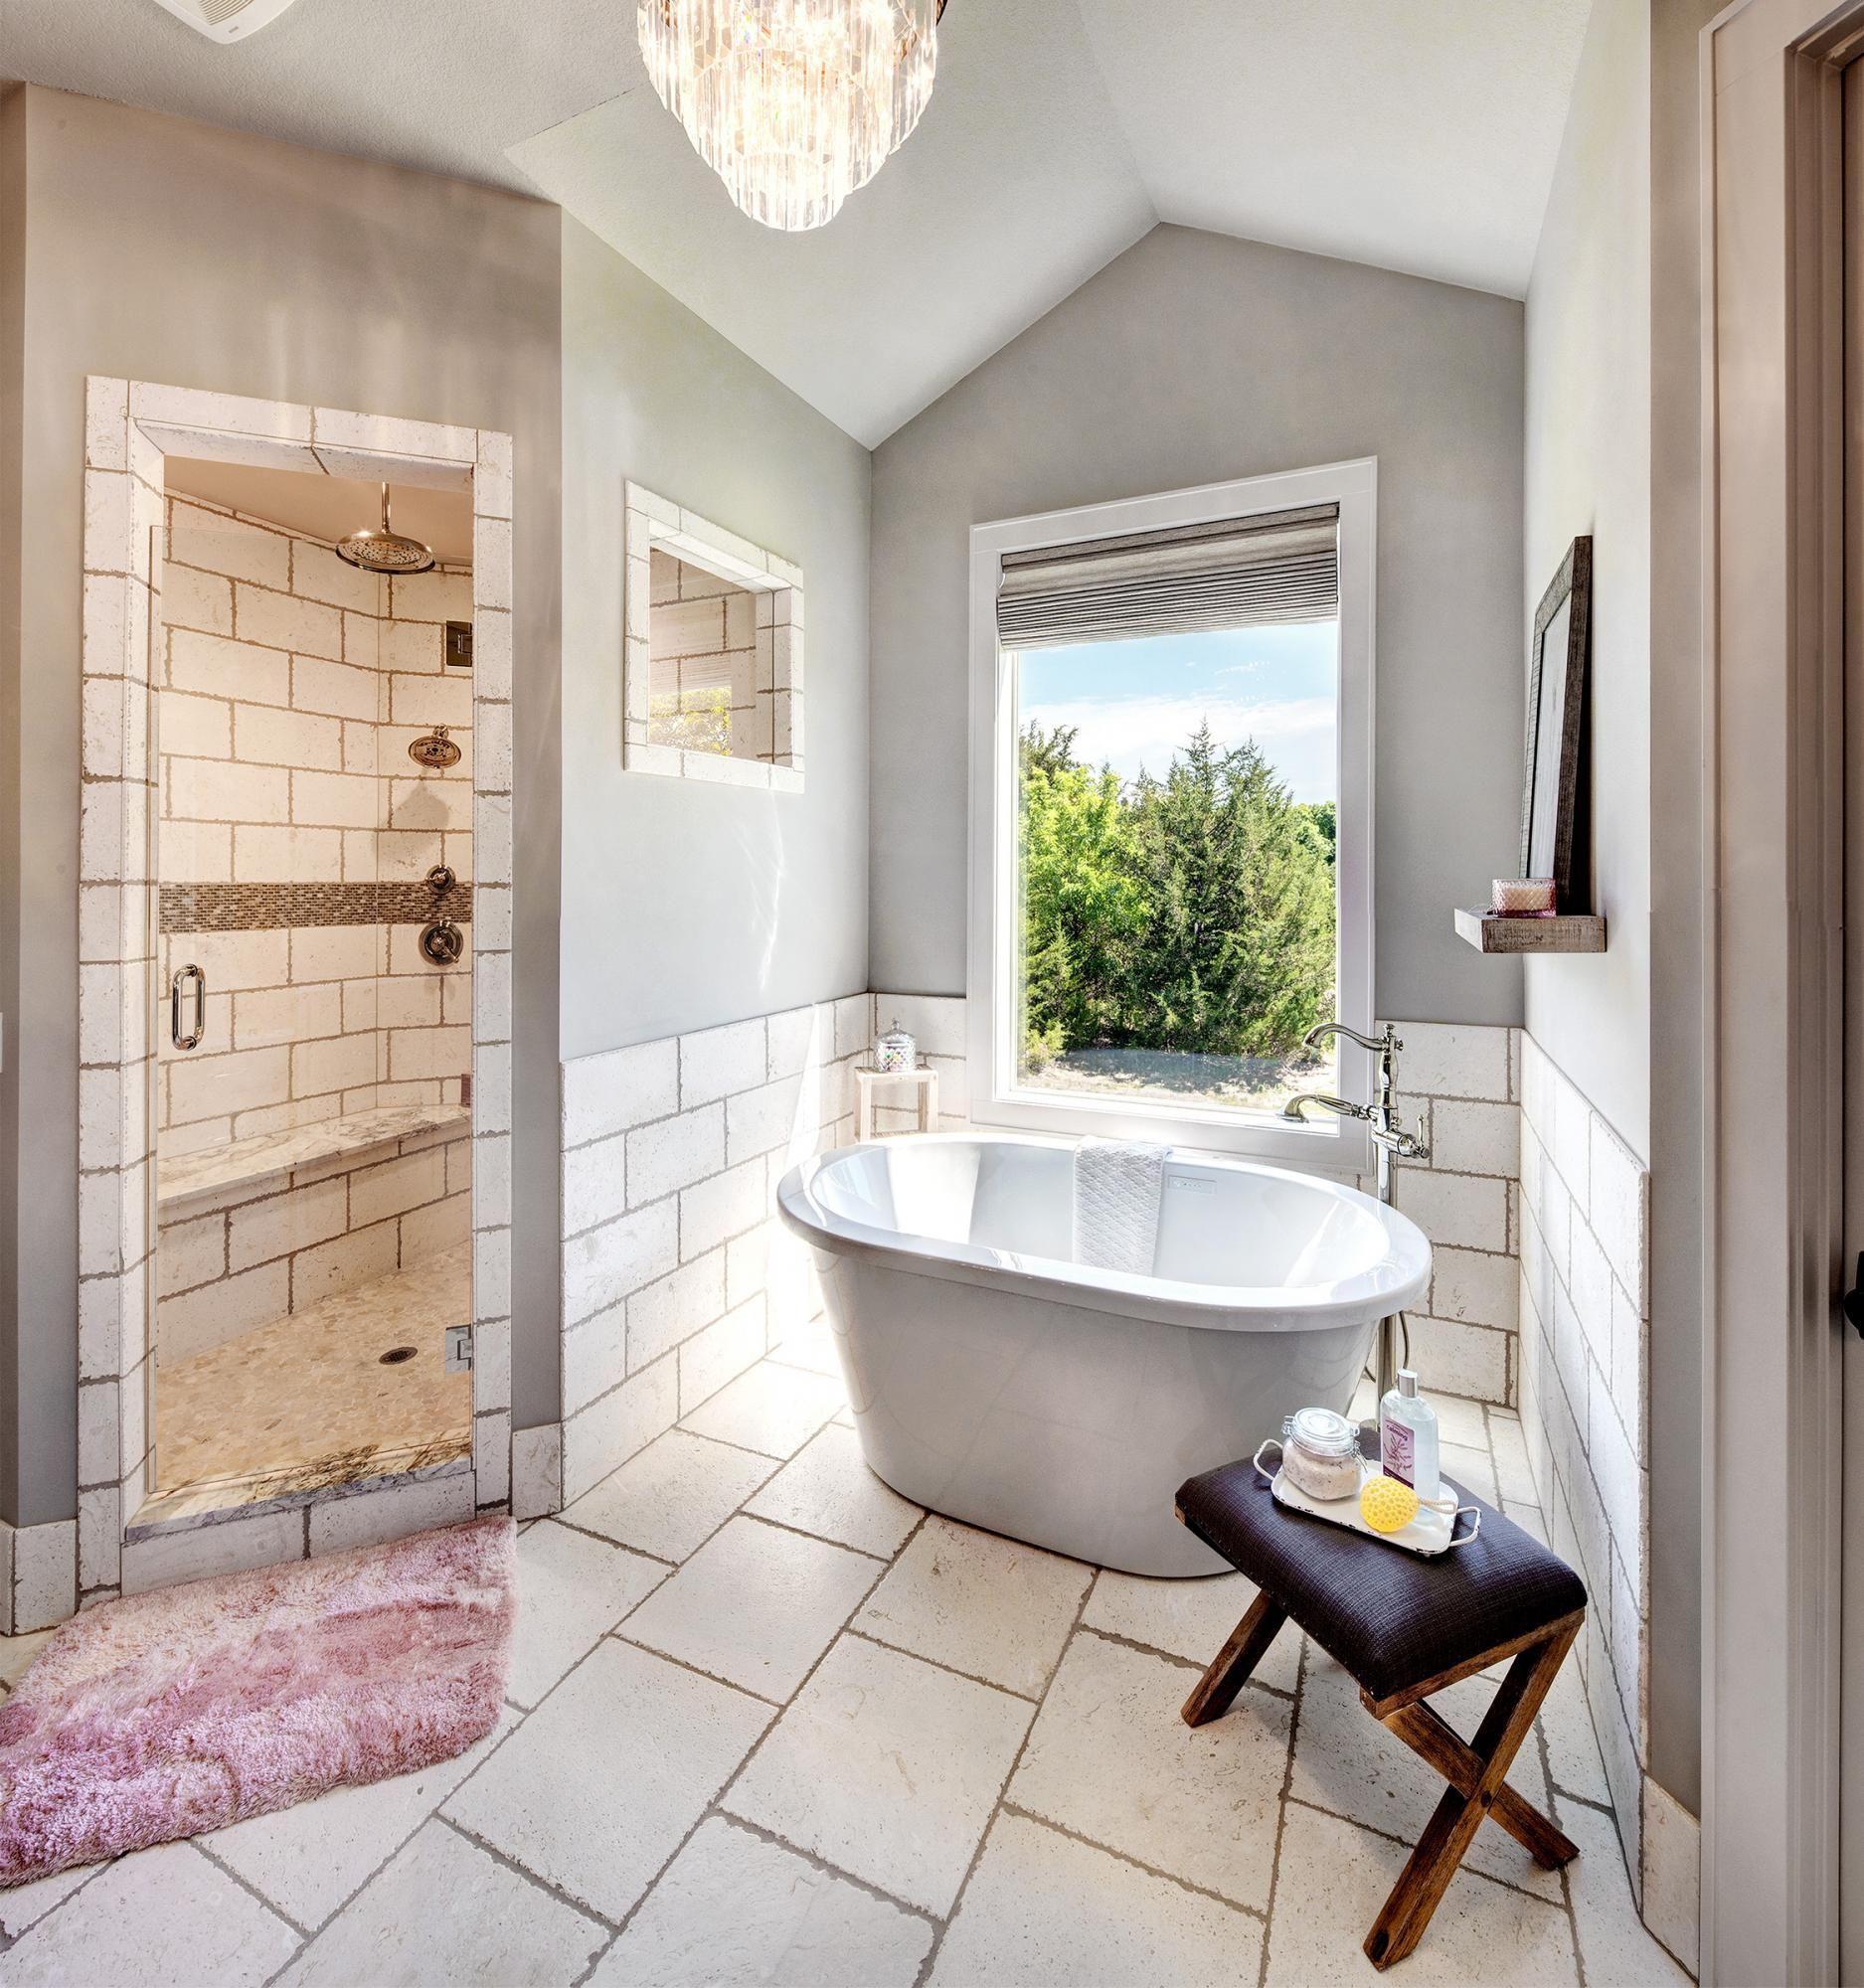 Bathrooms Photo Gallery Custom Homes In Kansas City Ks Starr Homes Bathroom Chandelier Beautiful Bathroom Designs Bathtub [ 2000 x 1875 Pixel ]